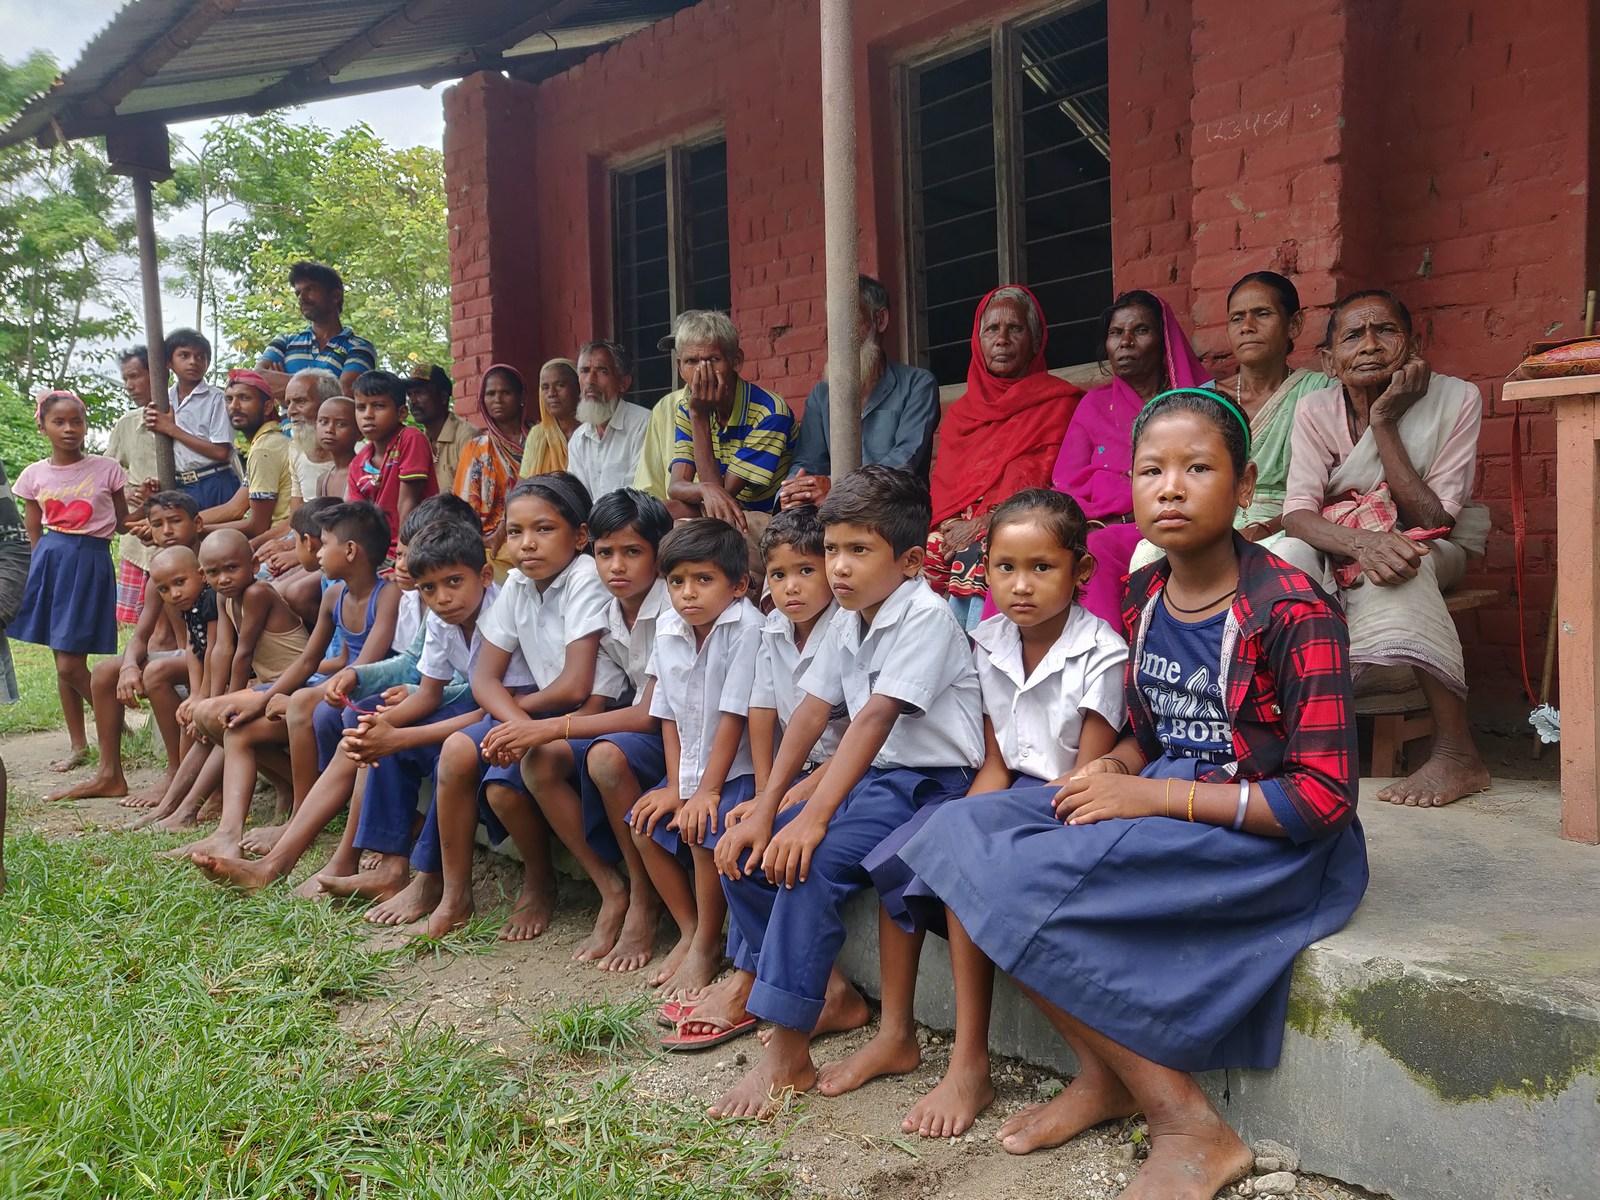 Free-Health-Camp-Eye-Screening-at-Gwala-Basti-Mechinagar-15-Jhapa-Nepal-Rotary-Club-of-Kakarvitta-10